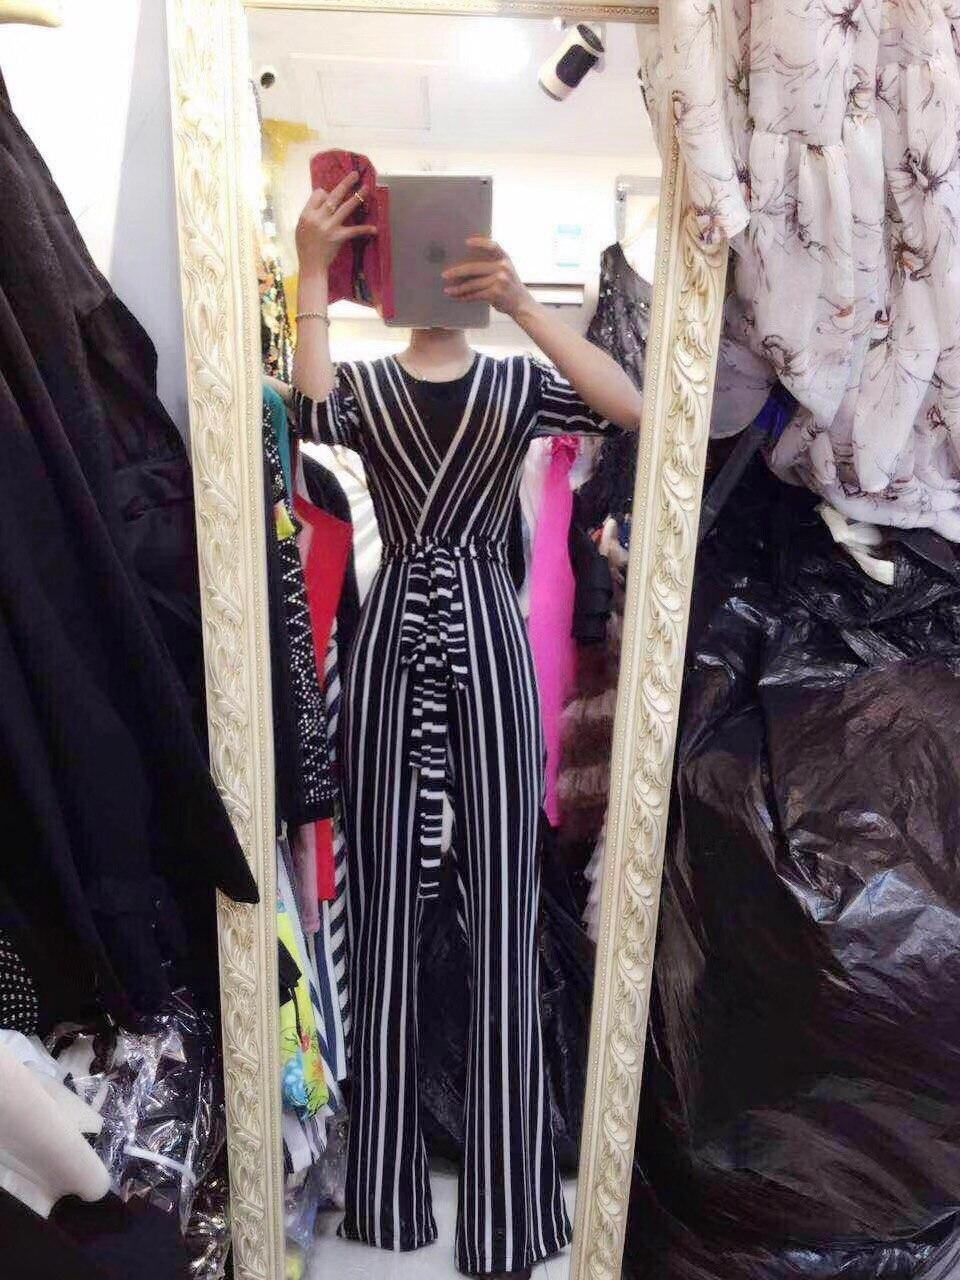 057a0d59ec6 LATIBELL 2018 Fashion Black White Short Sleeve Jumpsuit Sexy V Neck Sashes  Striped Elegant Summer Special Casual Clubwear festa. 10908 10909 10906  10907